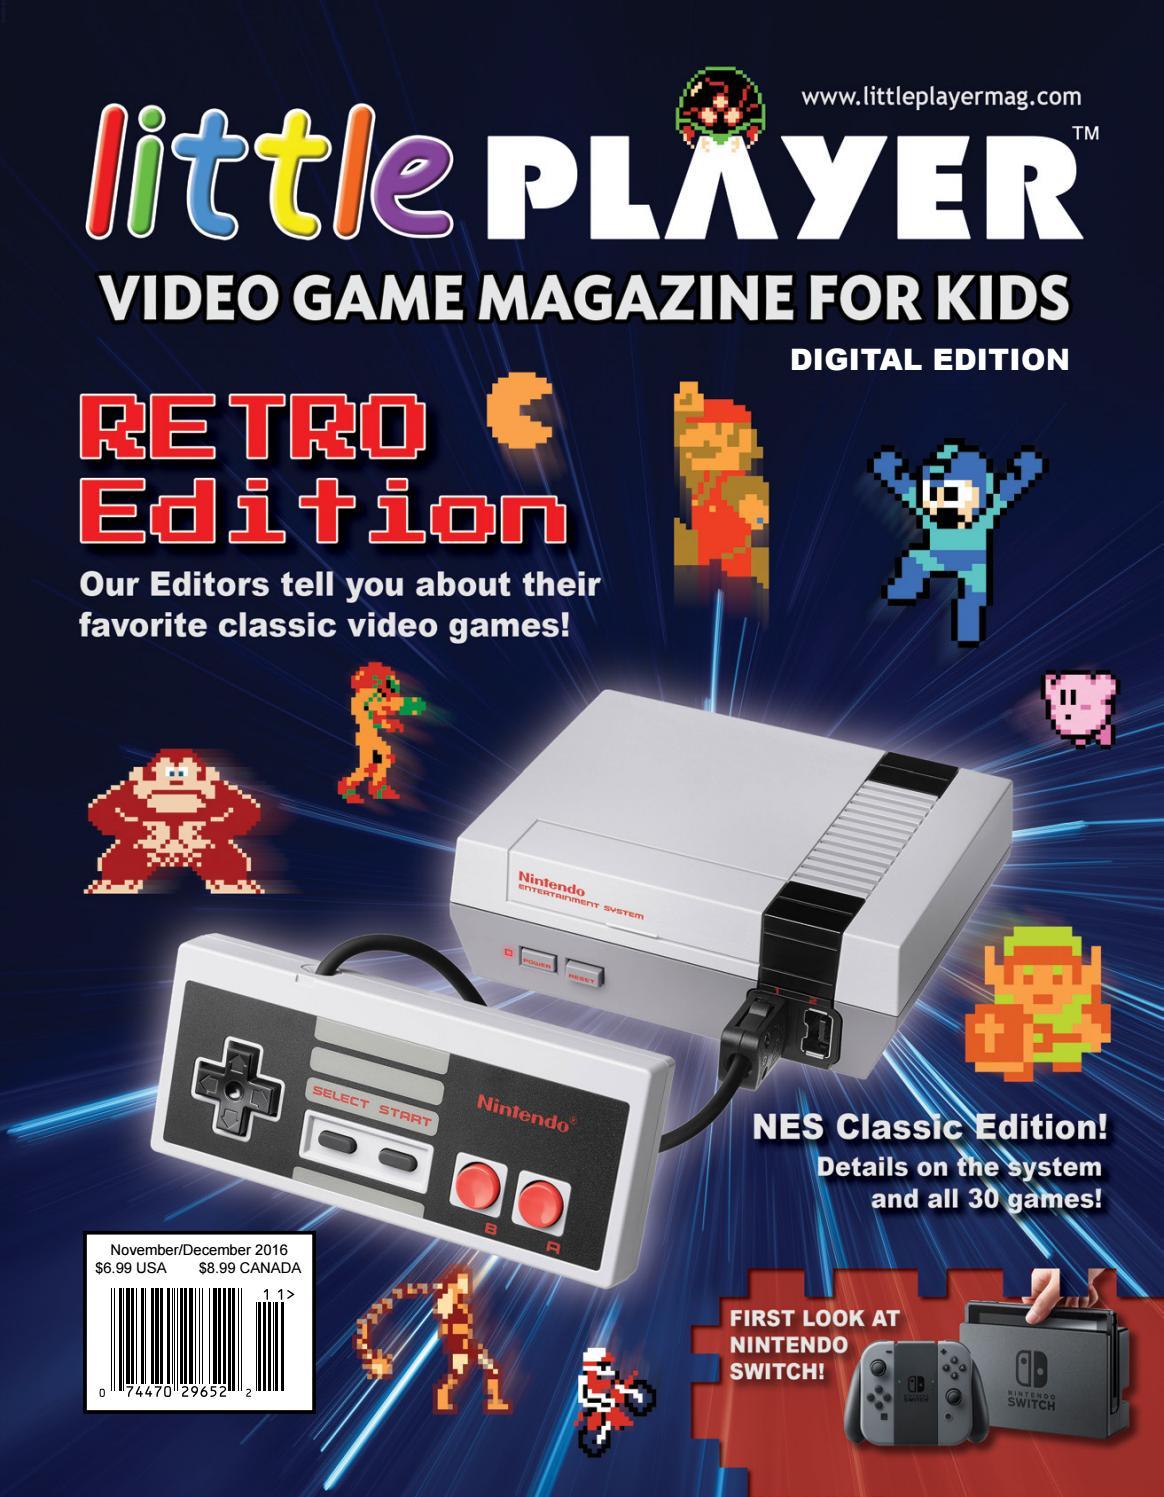 Little Player - Video Game Magazine for Kids - 04 Digital